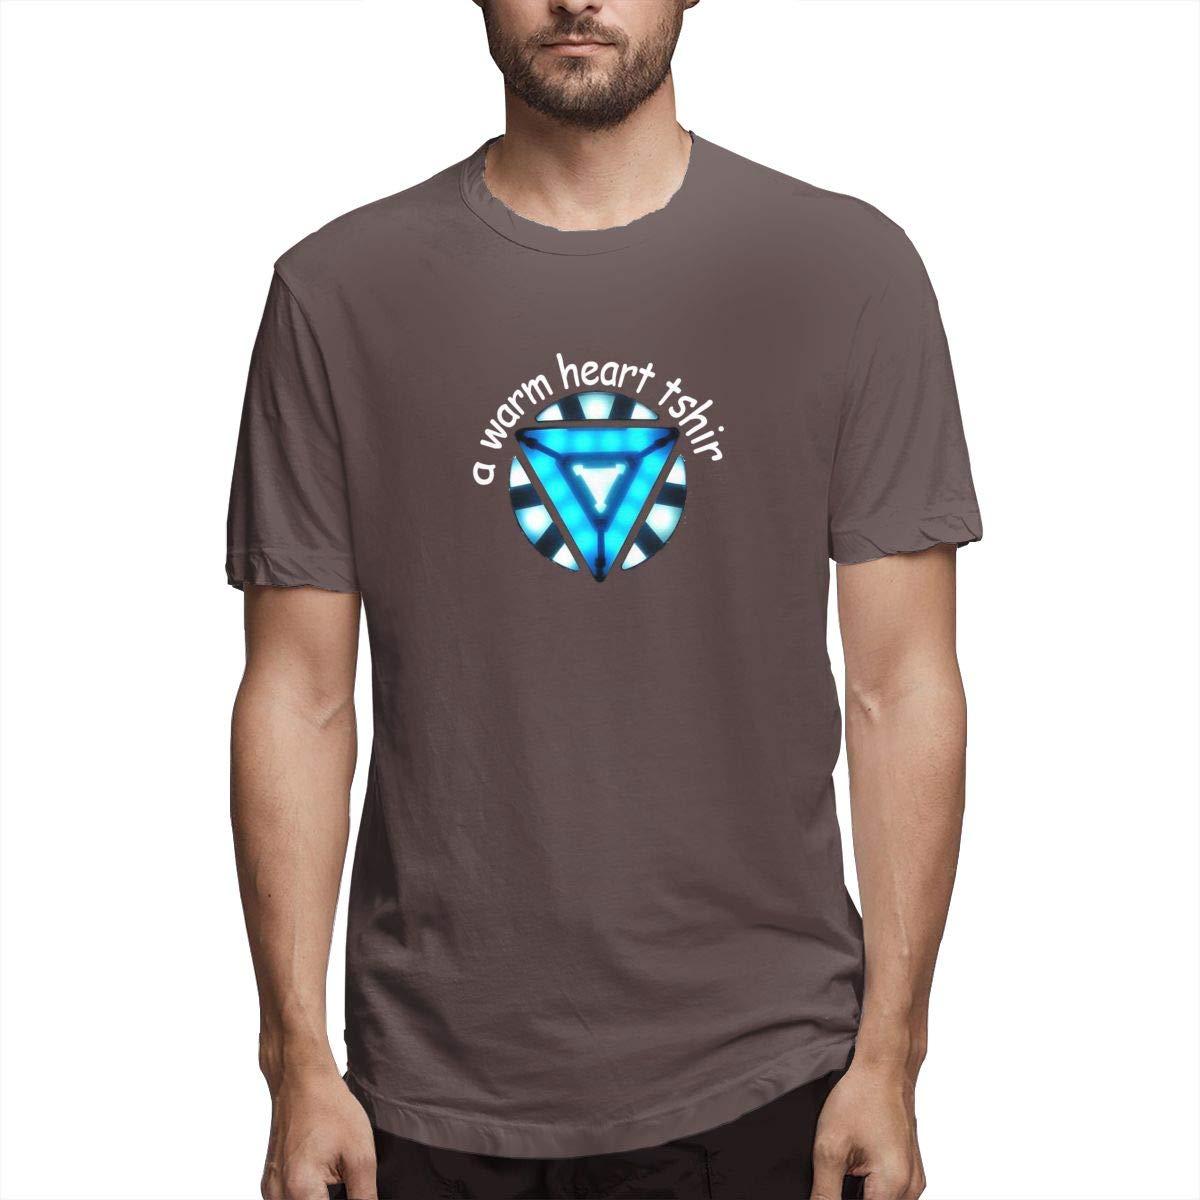 Familygam T Shirt A Warm Heart 3918